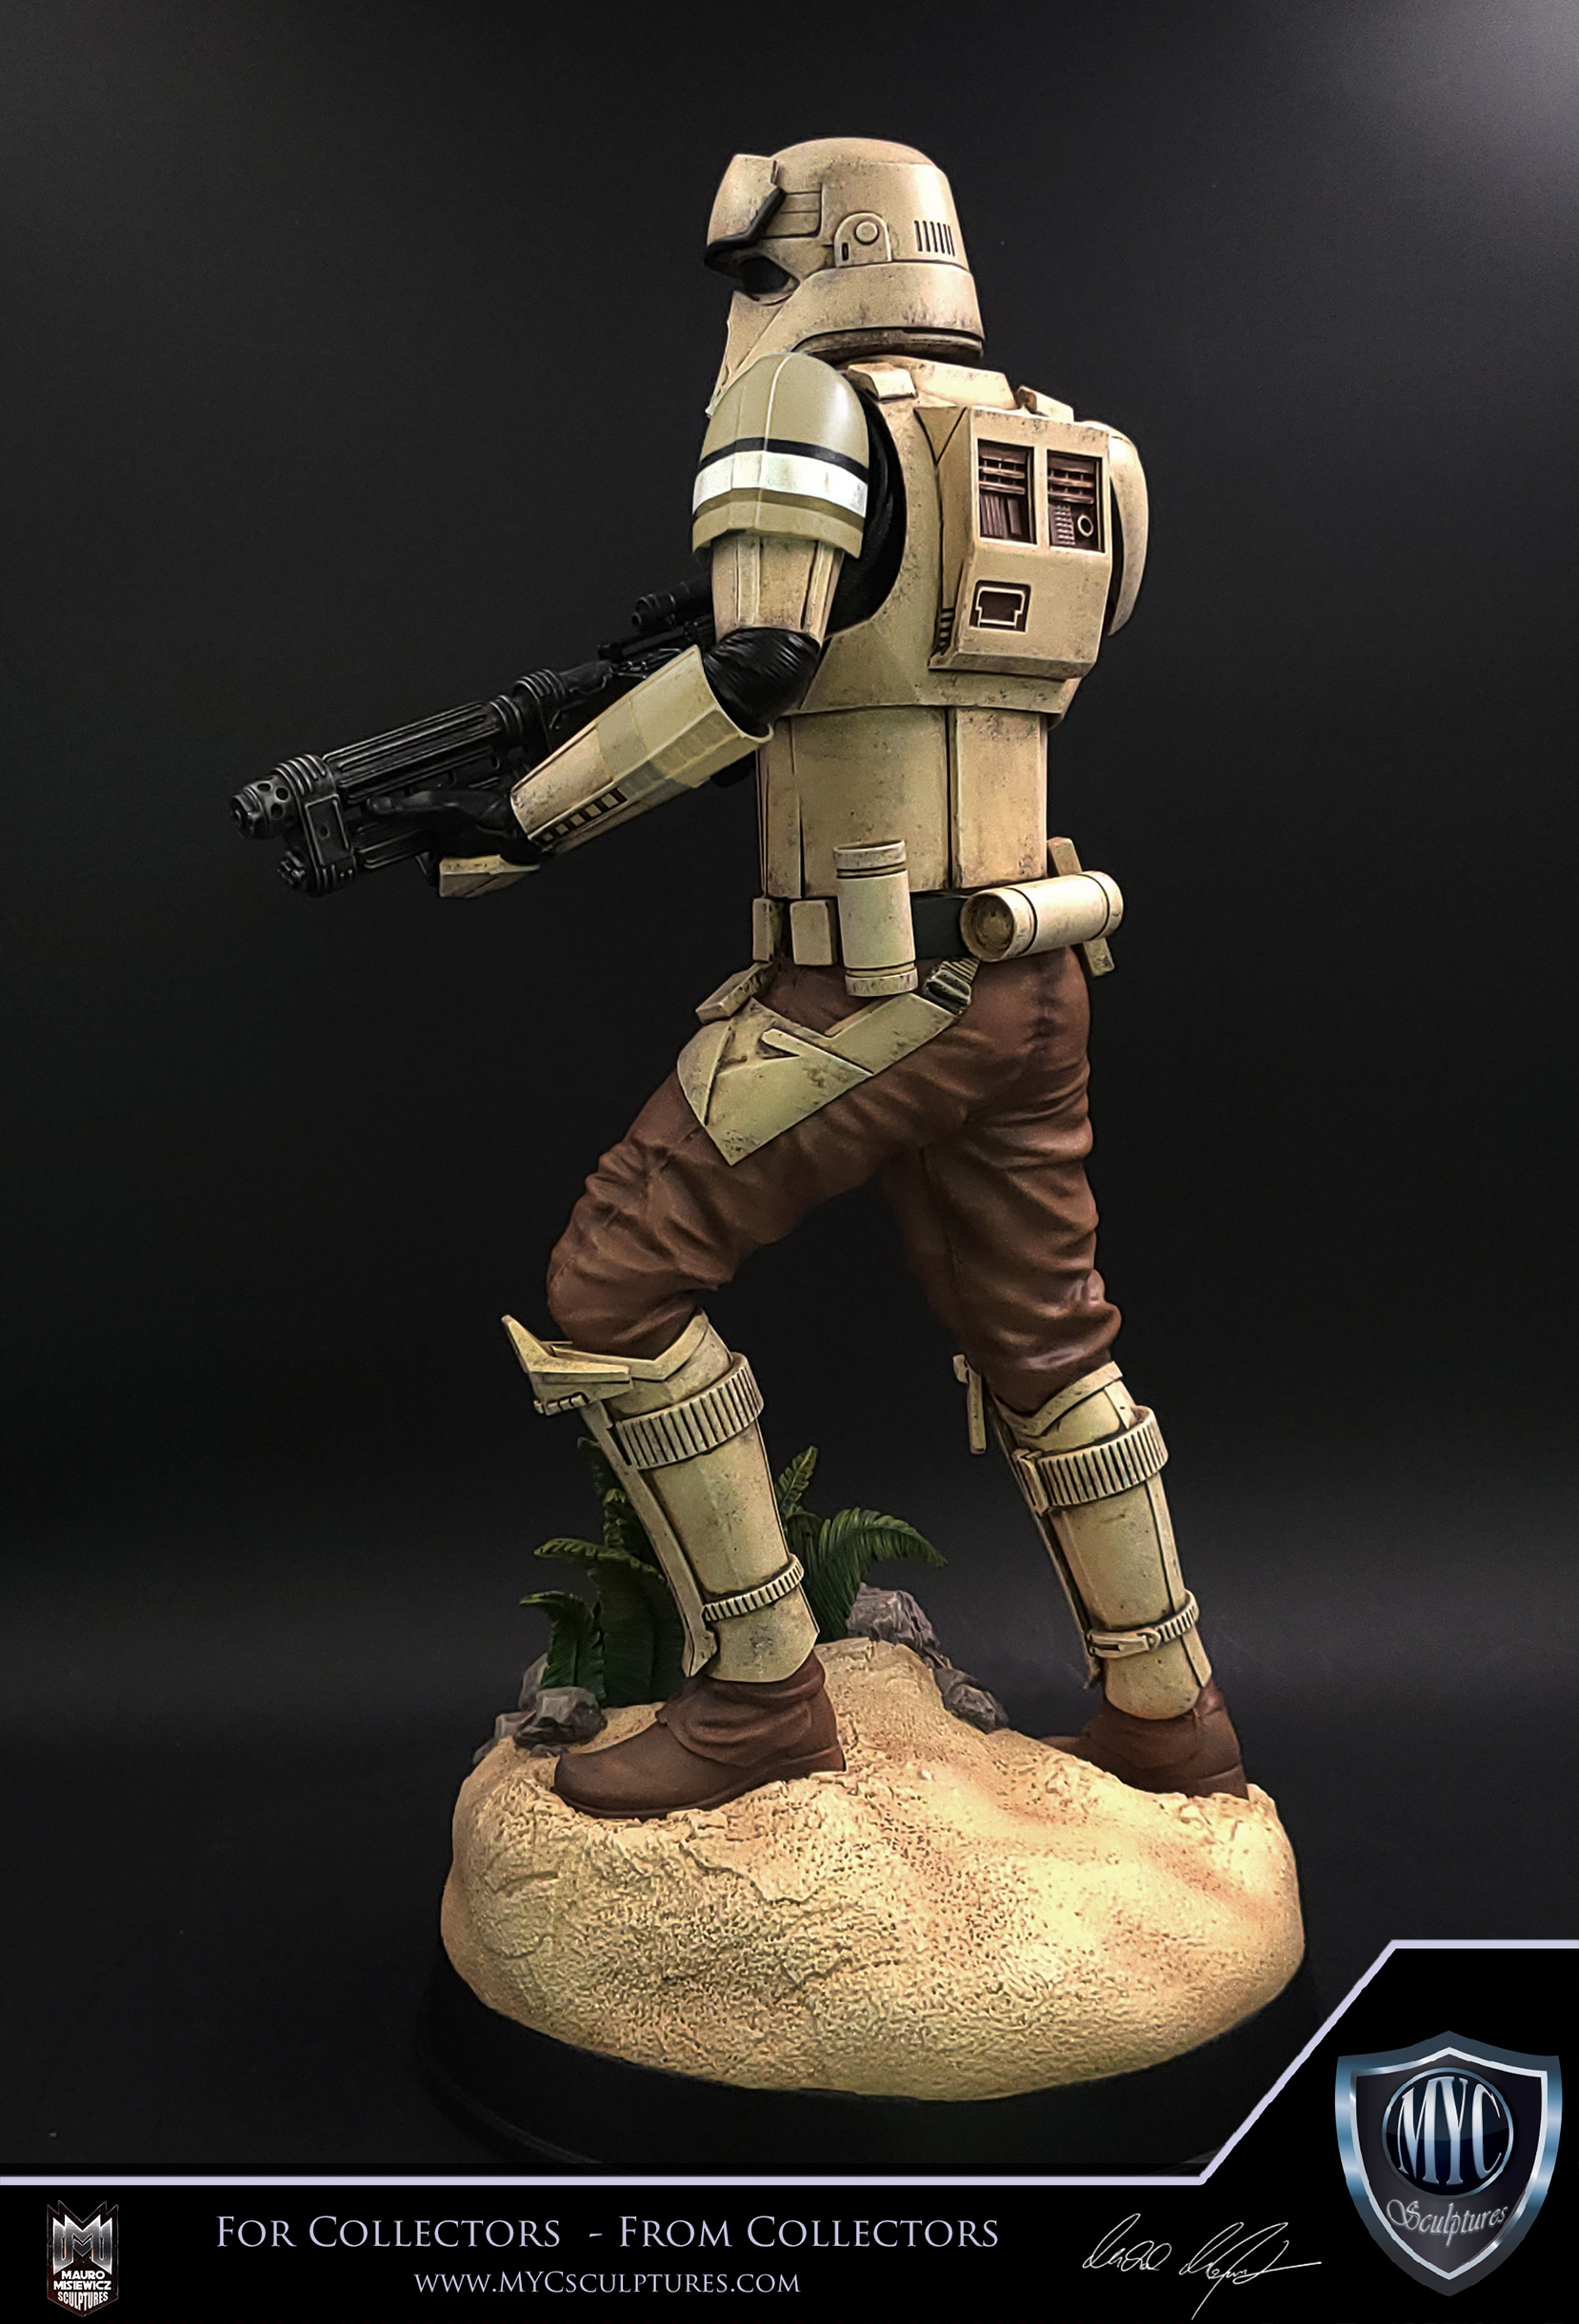 Grunt_Shoretrooper_MYC_Sculptures (6)